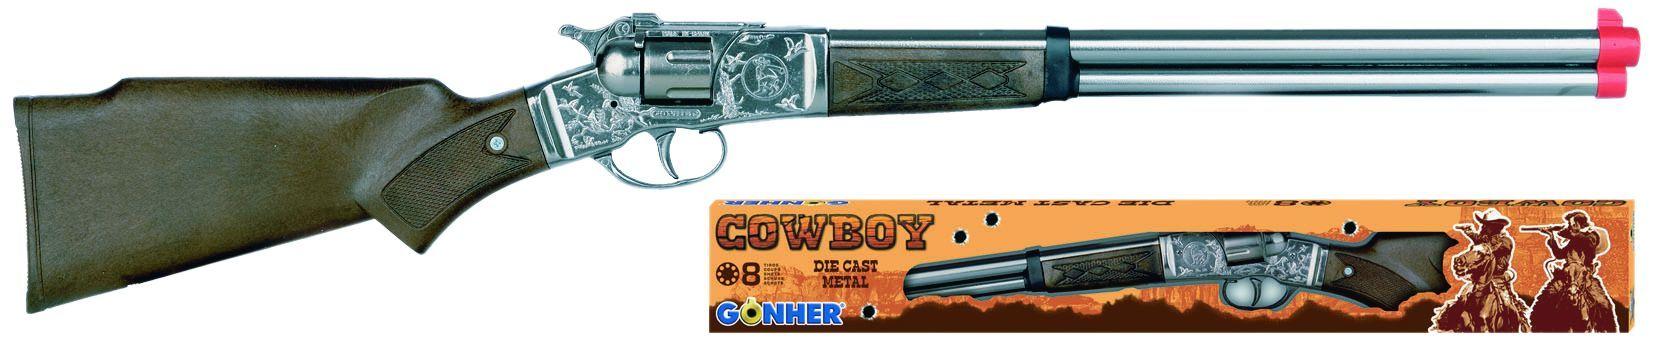 Pusca de cowboy cu capse Gonher imagine hippoland.ro